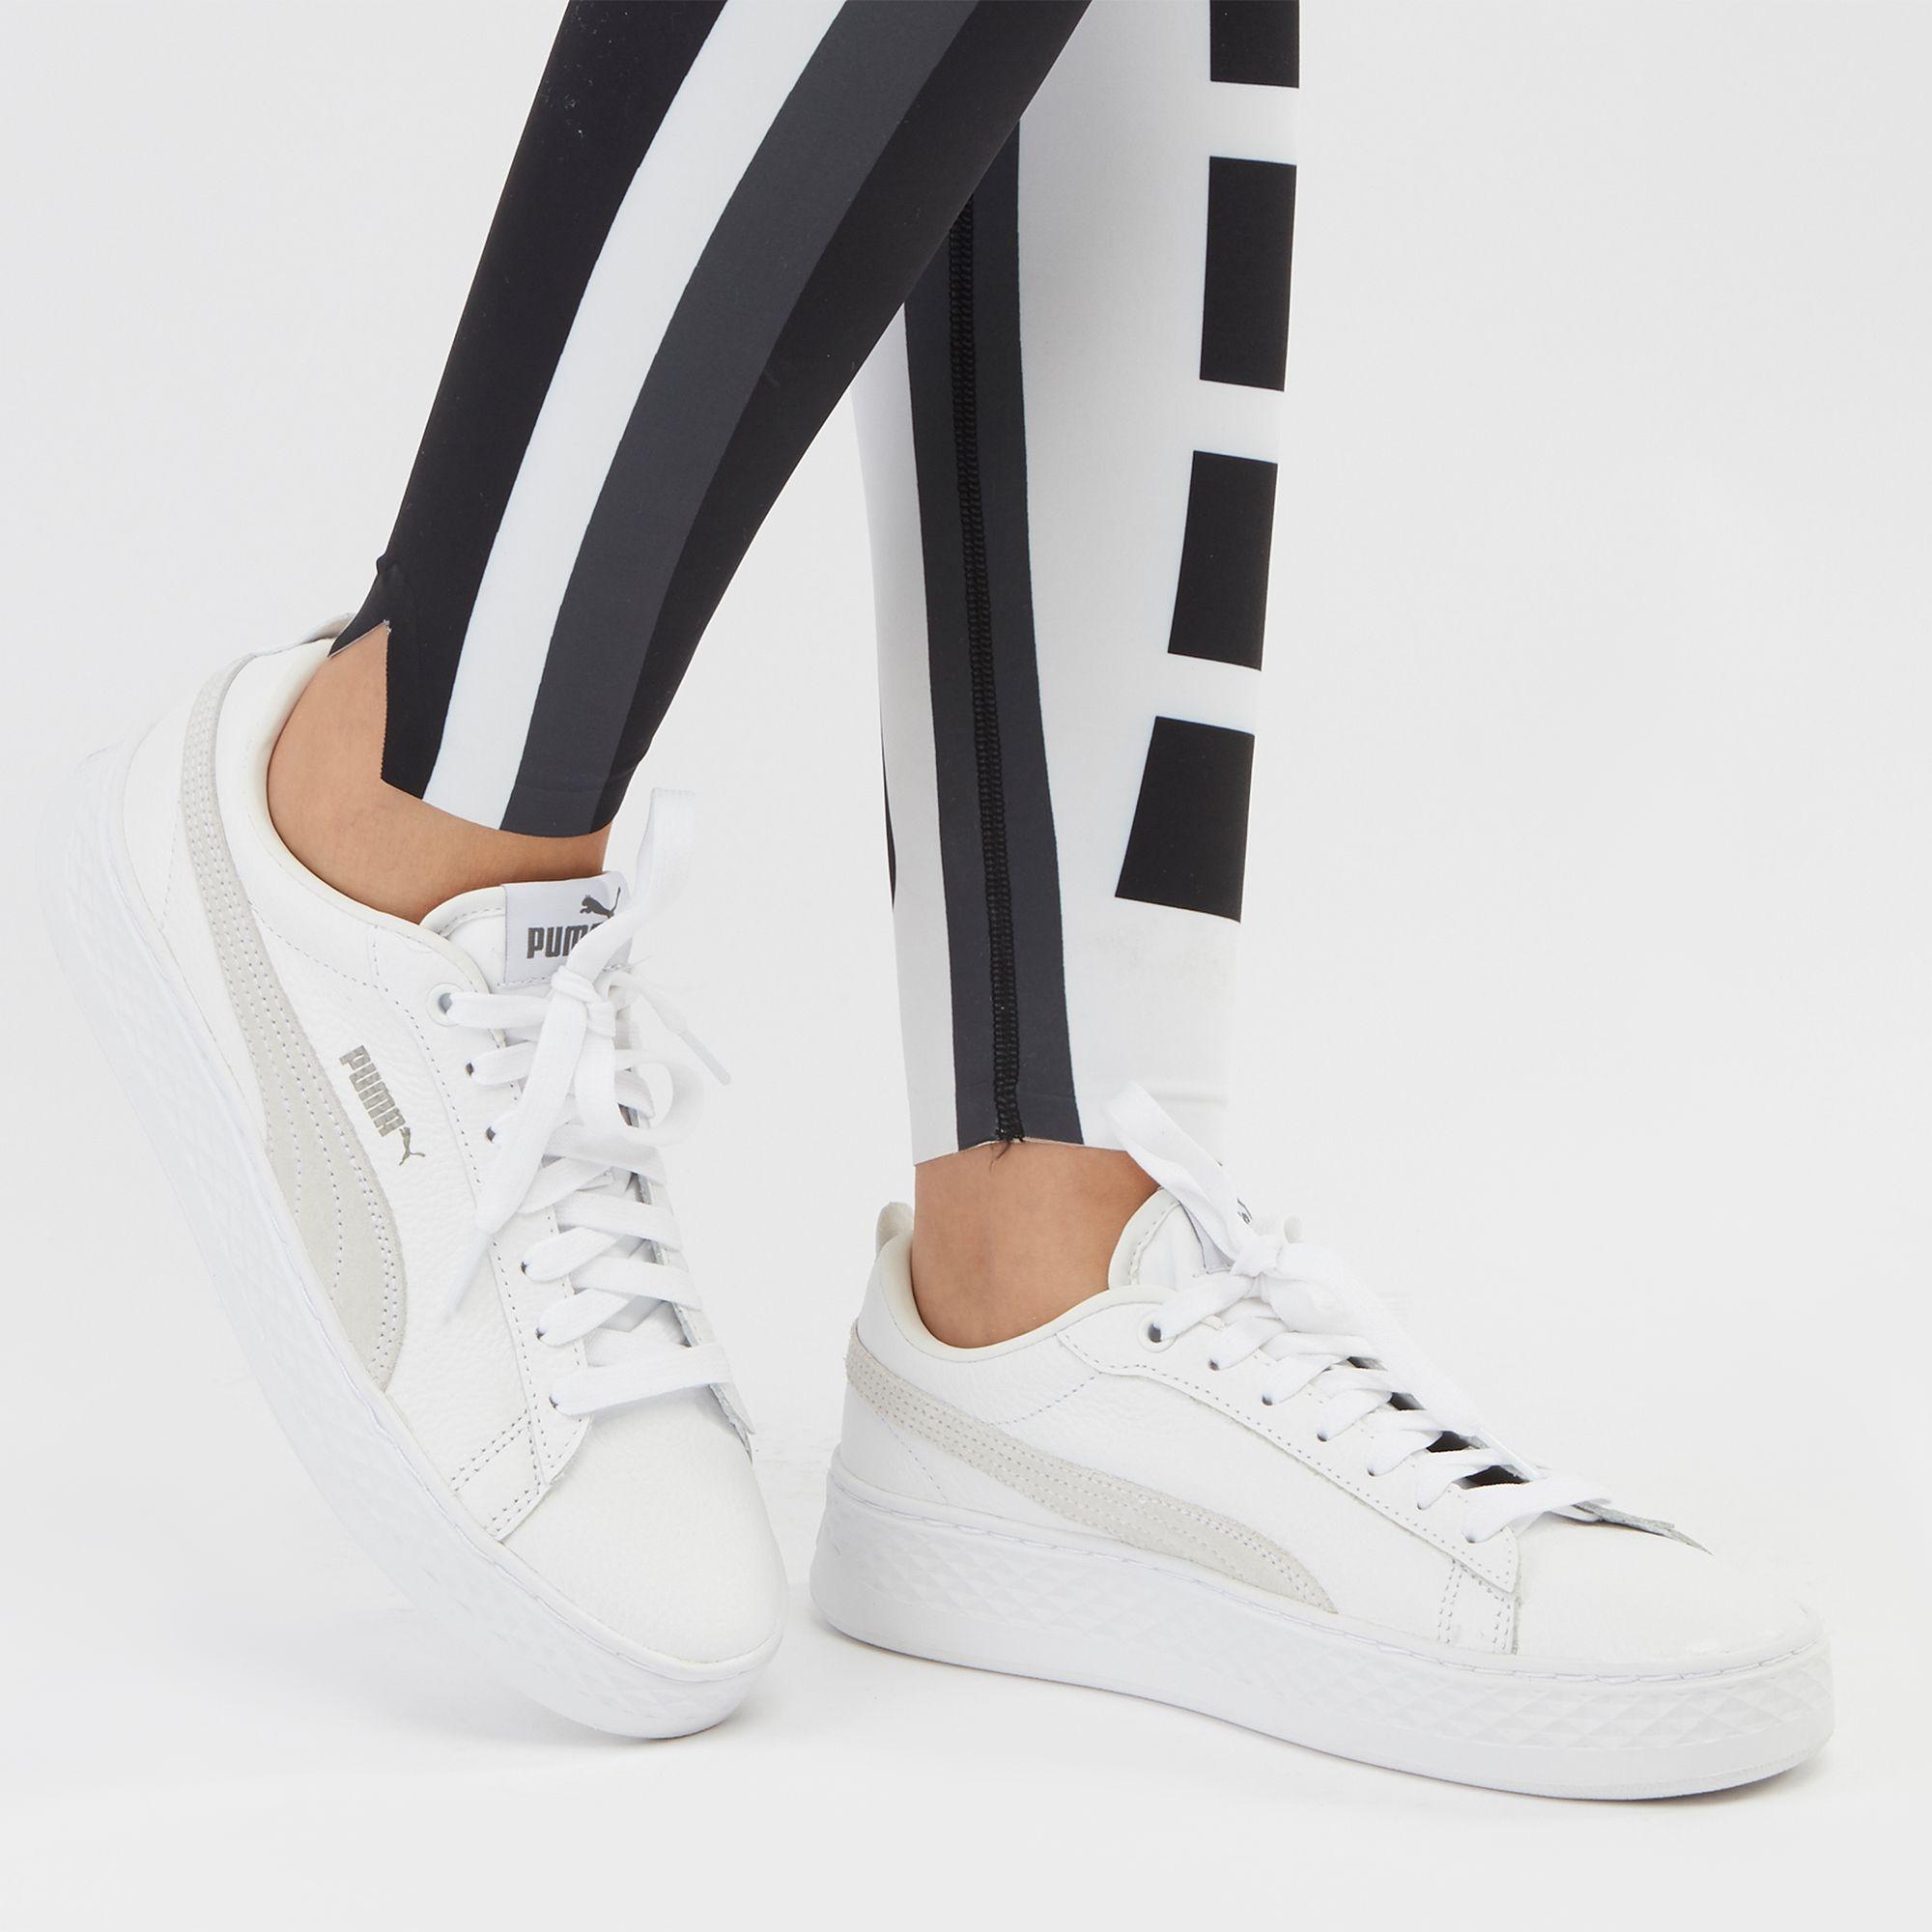 2bf31c134e5d Smash Sale Women s Puma Platform Shoe Sneakers Sss Shoes vHHqAdY